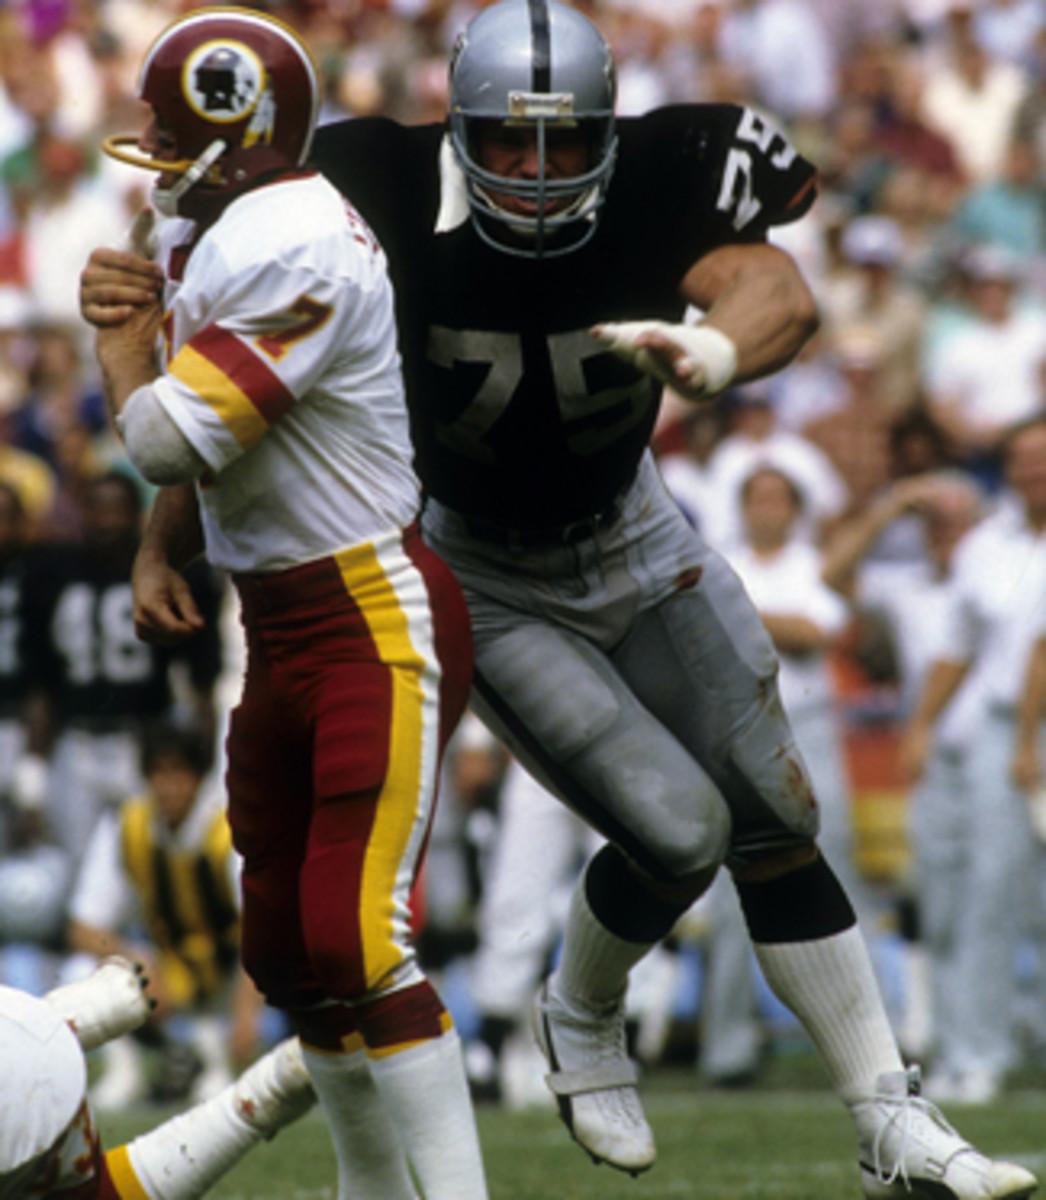 Long hits Joe Theismann in Super Bowl XVIII.